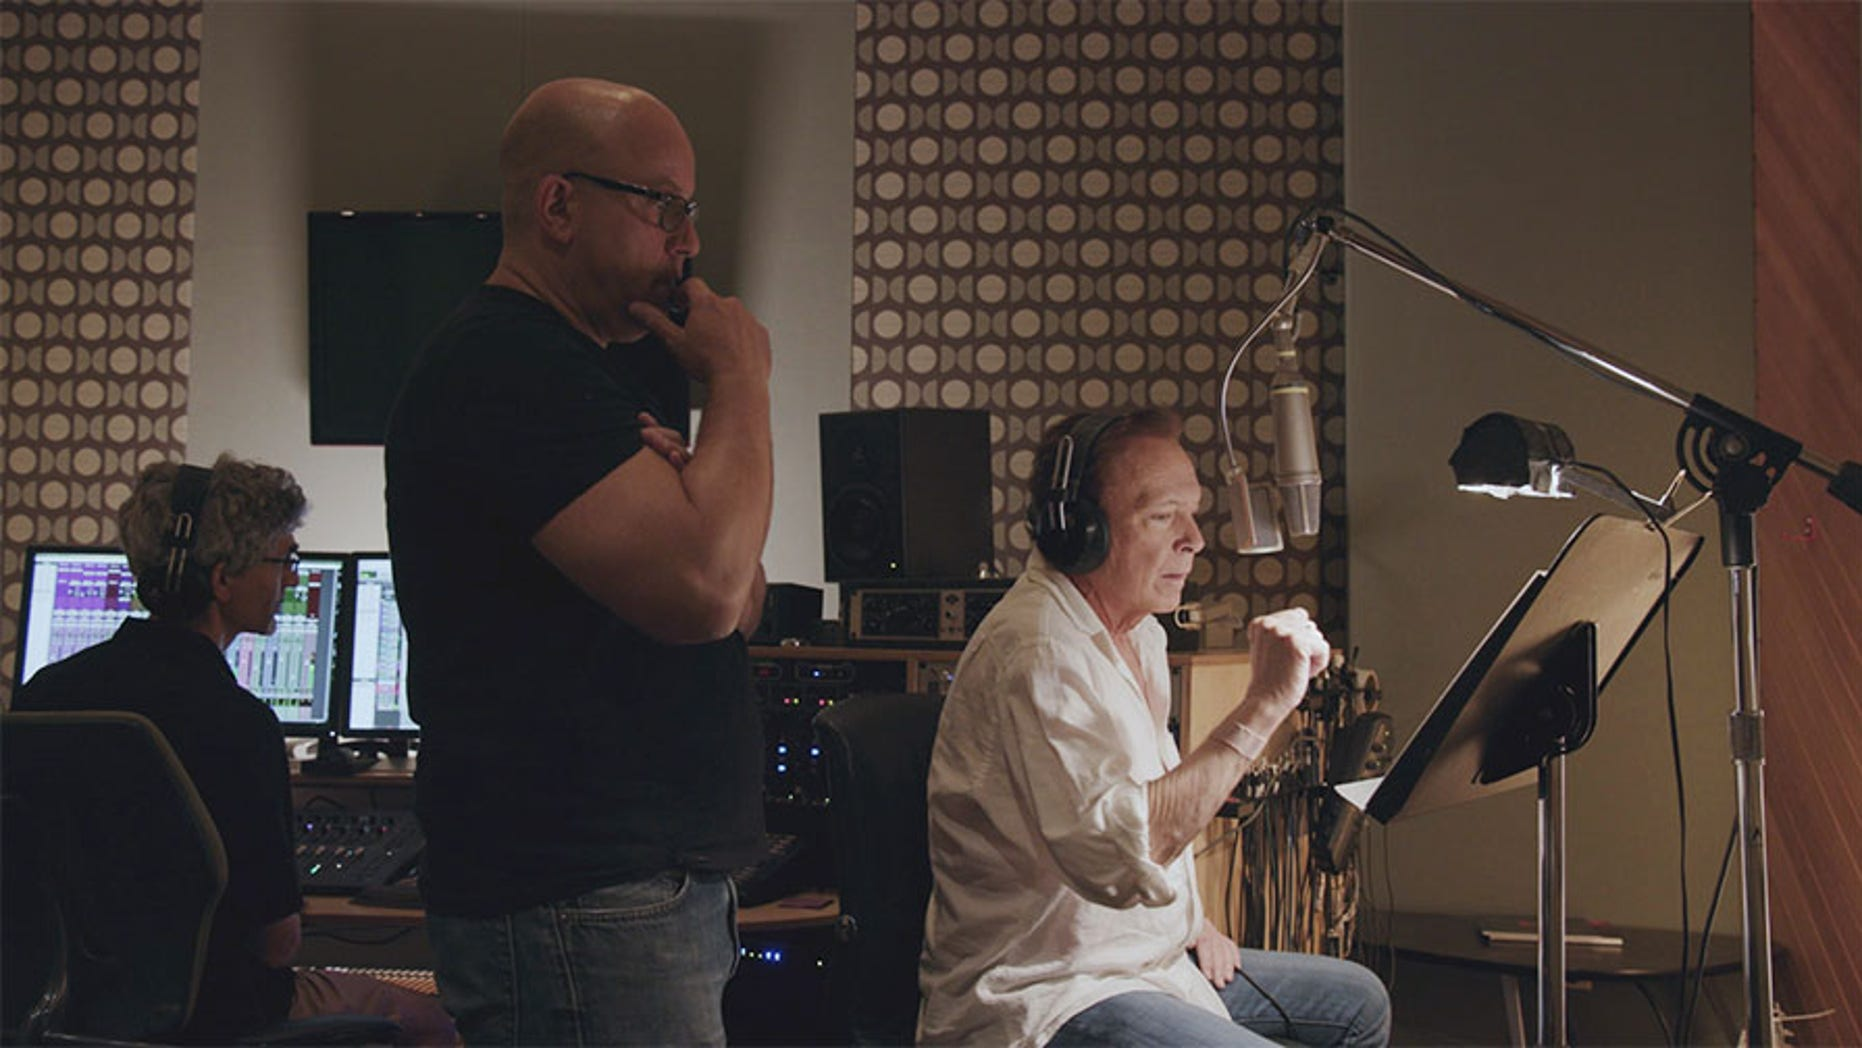 David Cassidy recording his last EP.